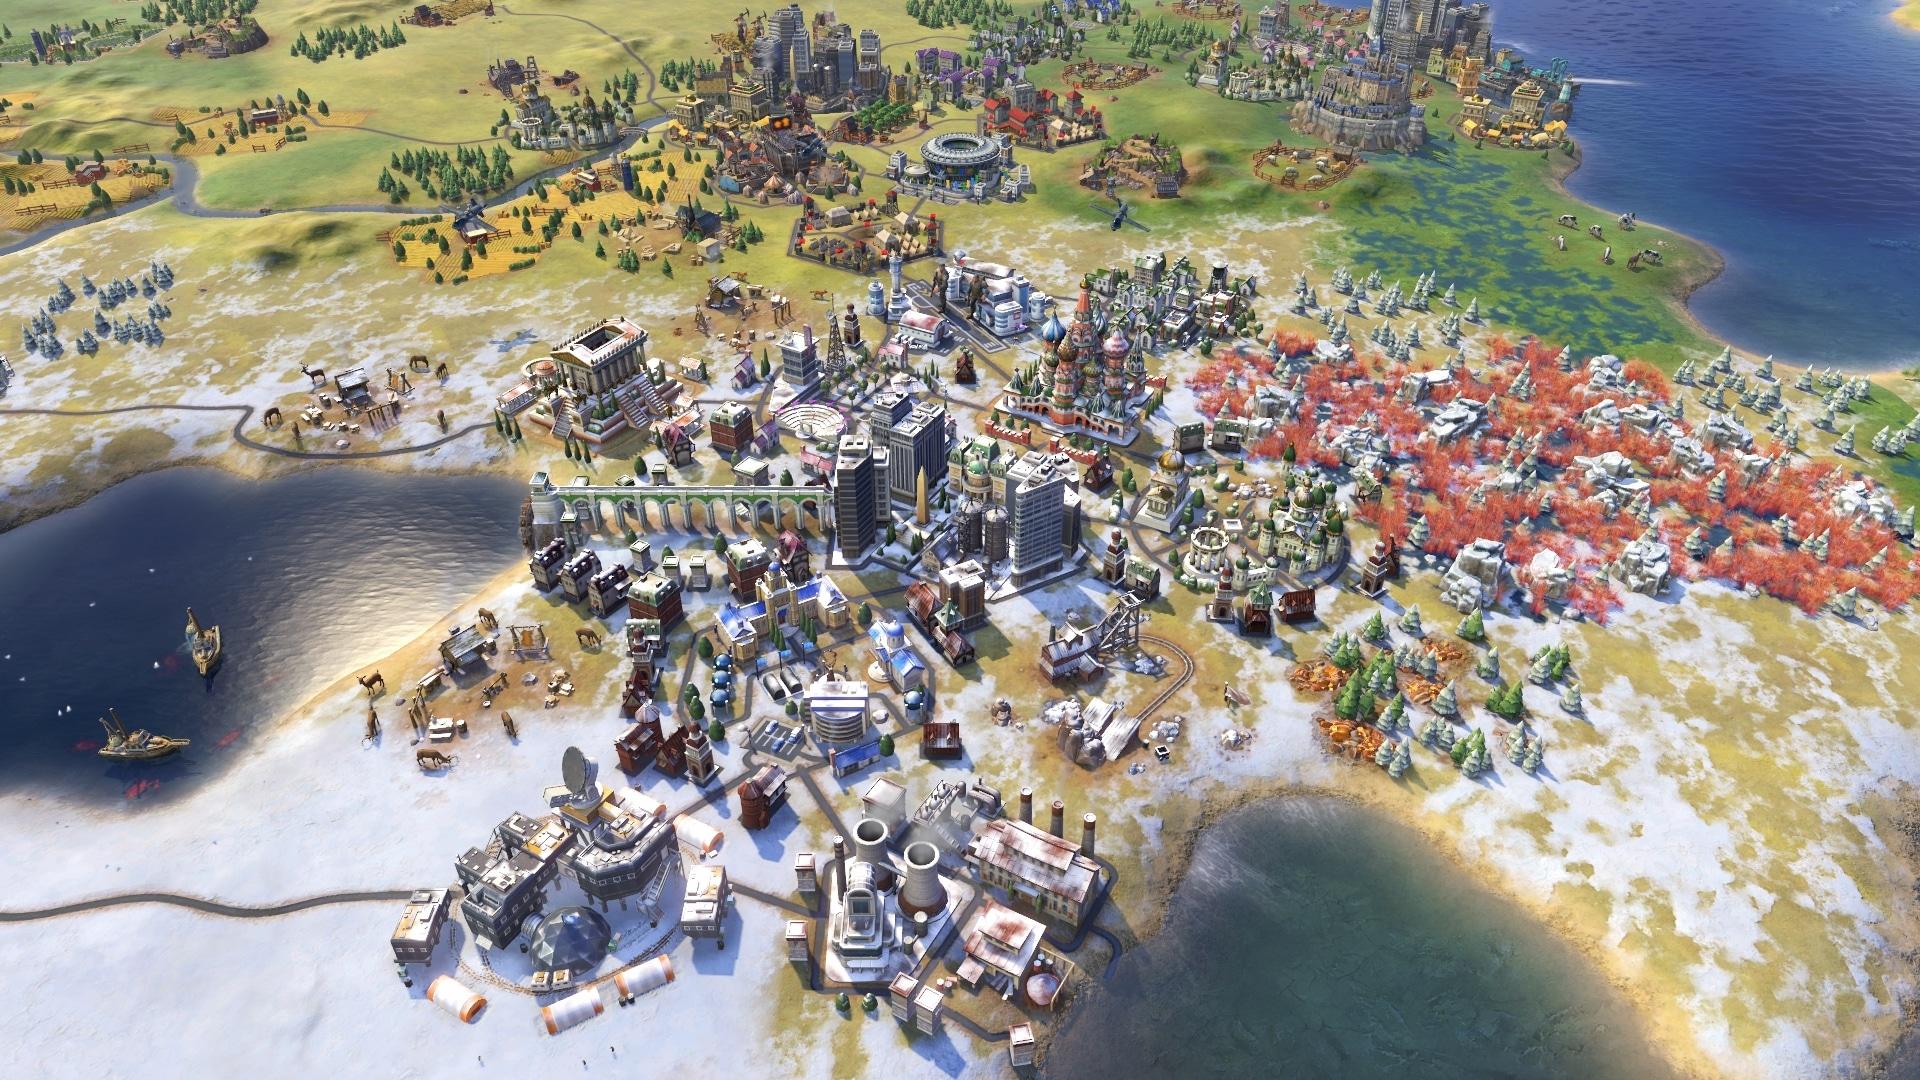 Sid meier's civilization vi download full game pc.